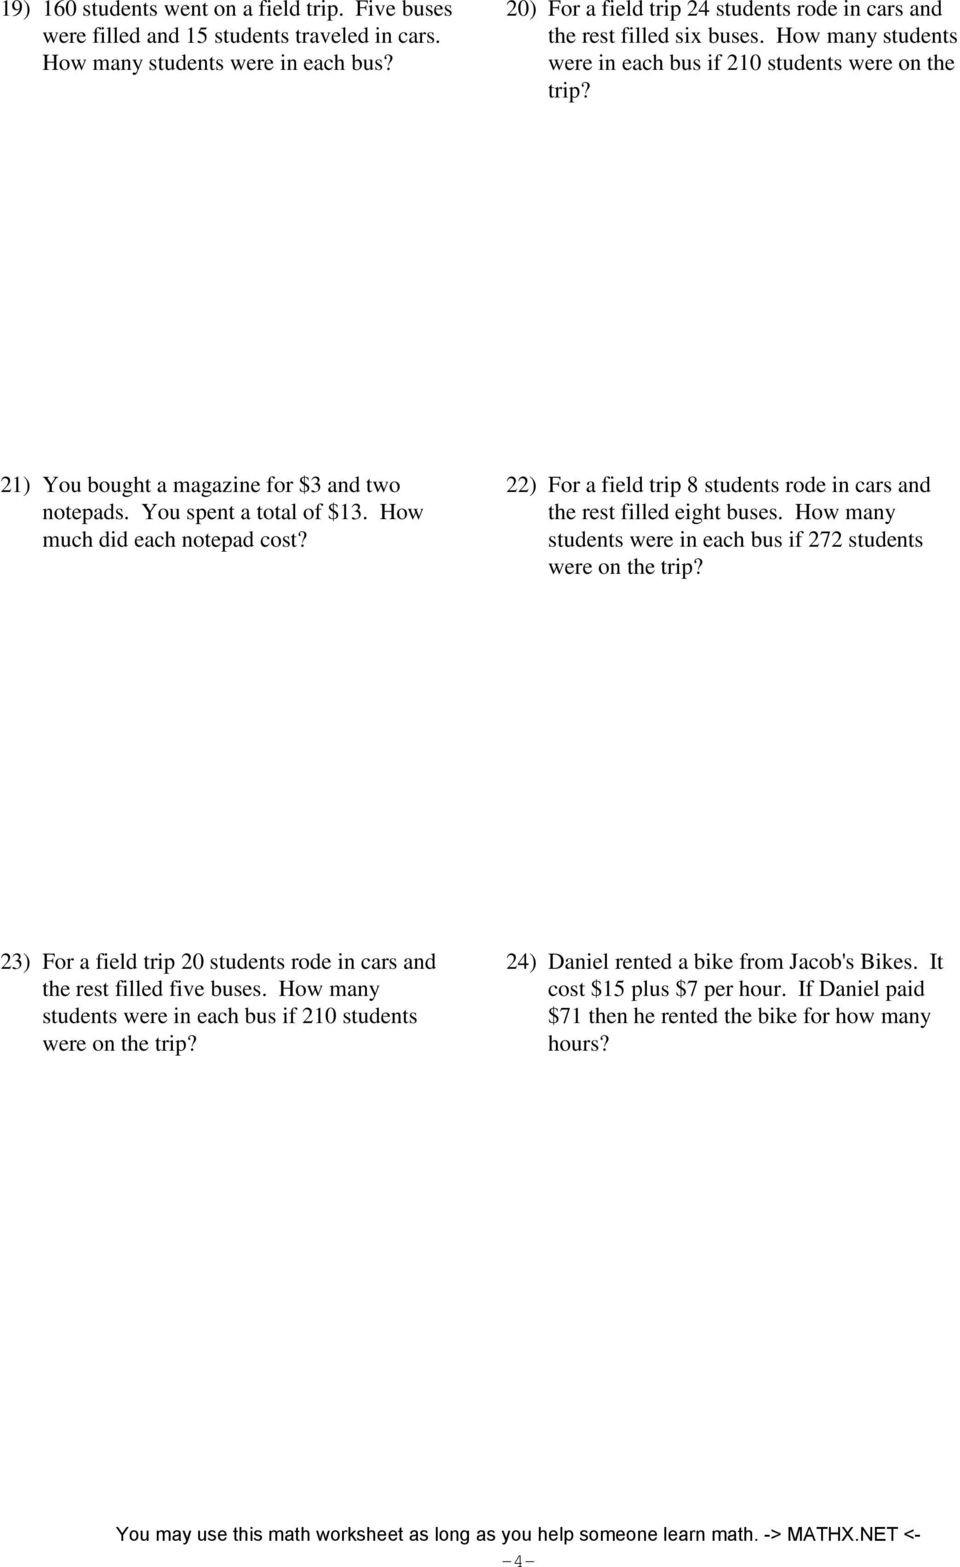 Algebra Word Problems Worksheet Pdf Two Step Equations Word Problems Integers Pdf Free